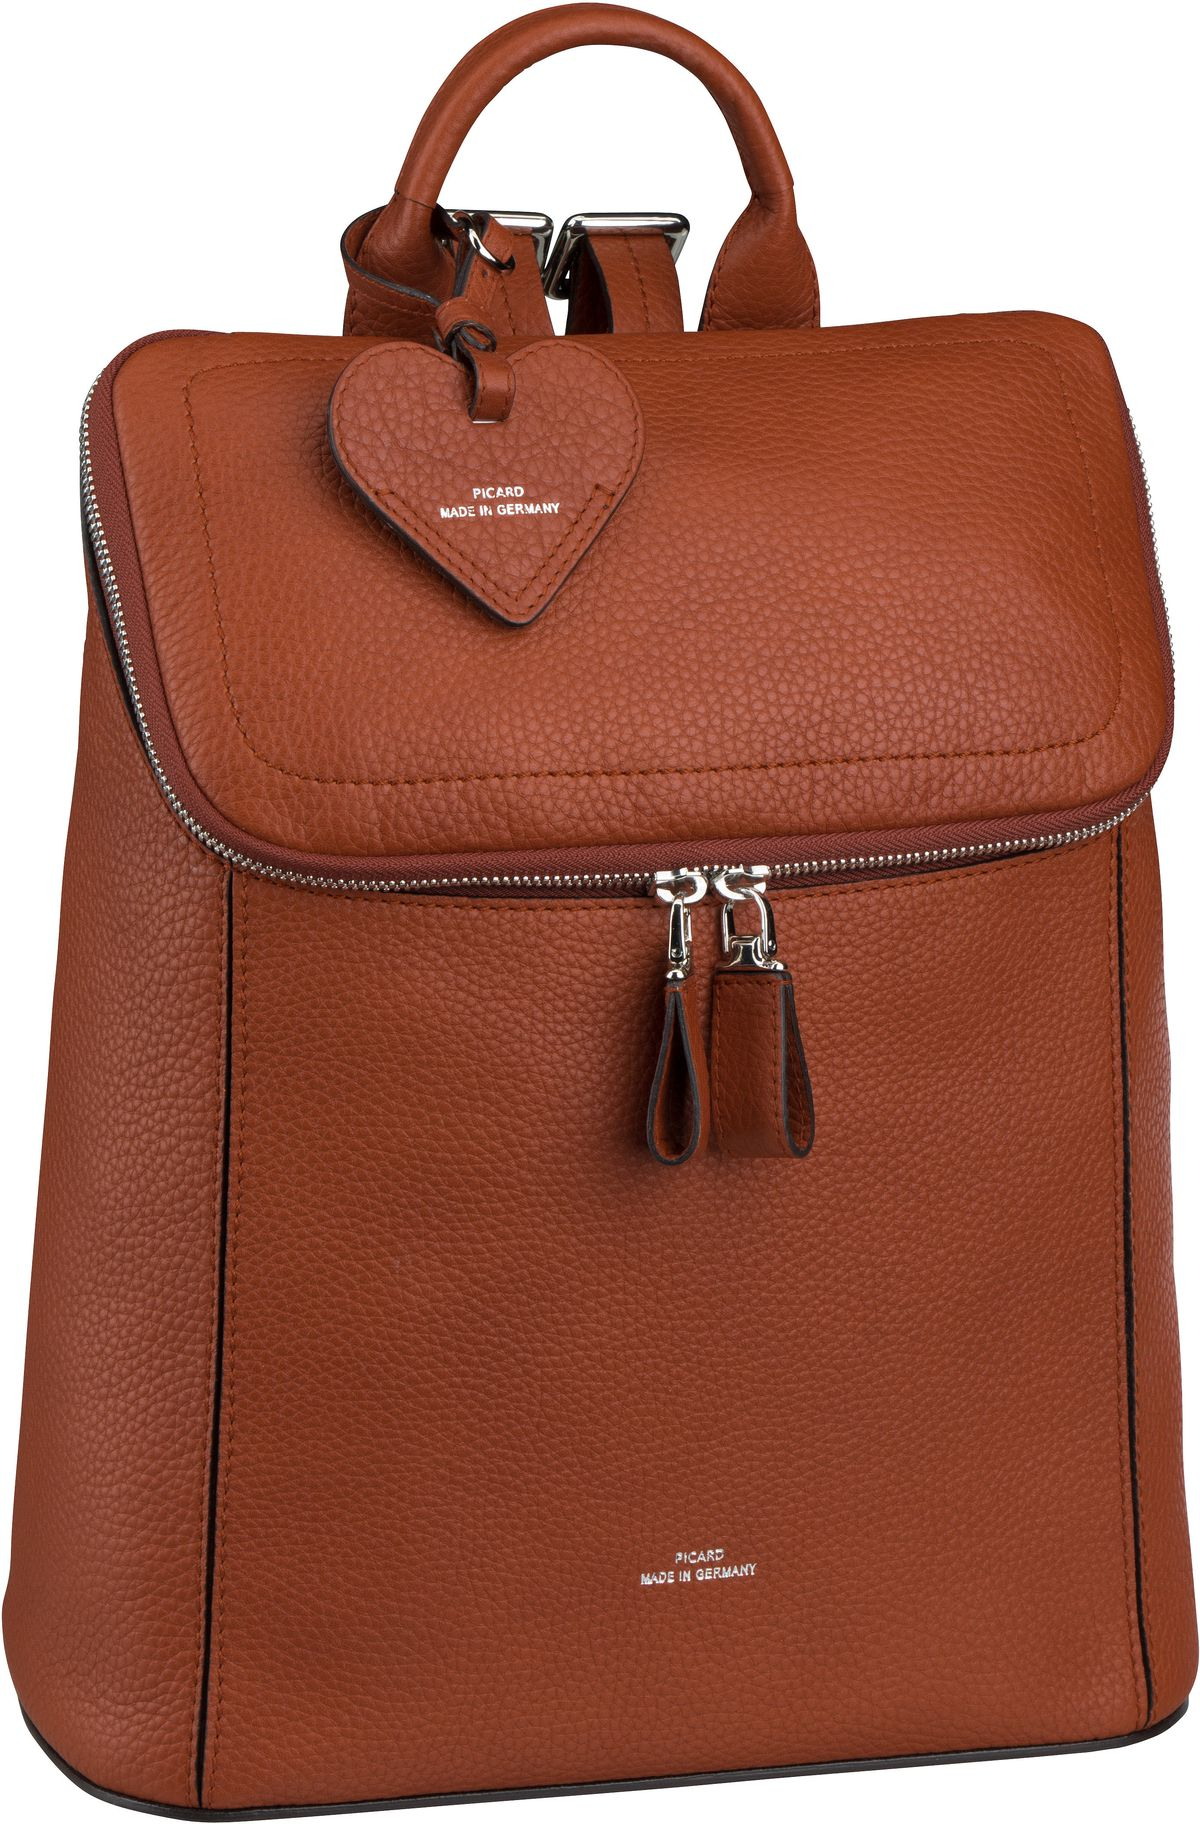 Rucksack / Daypack Juliette 4859 Cognac